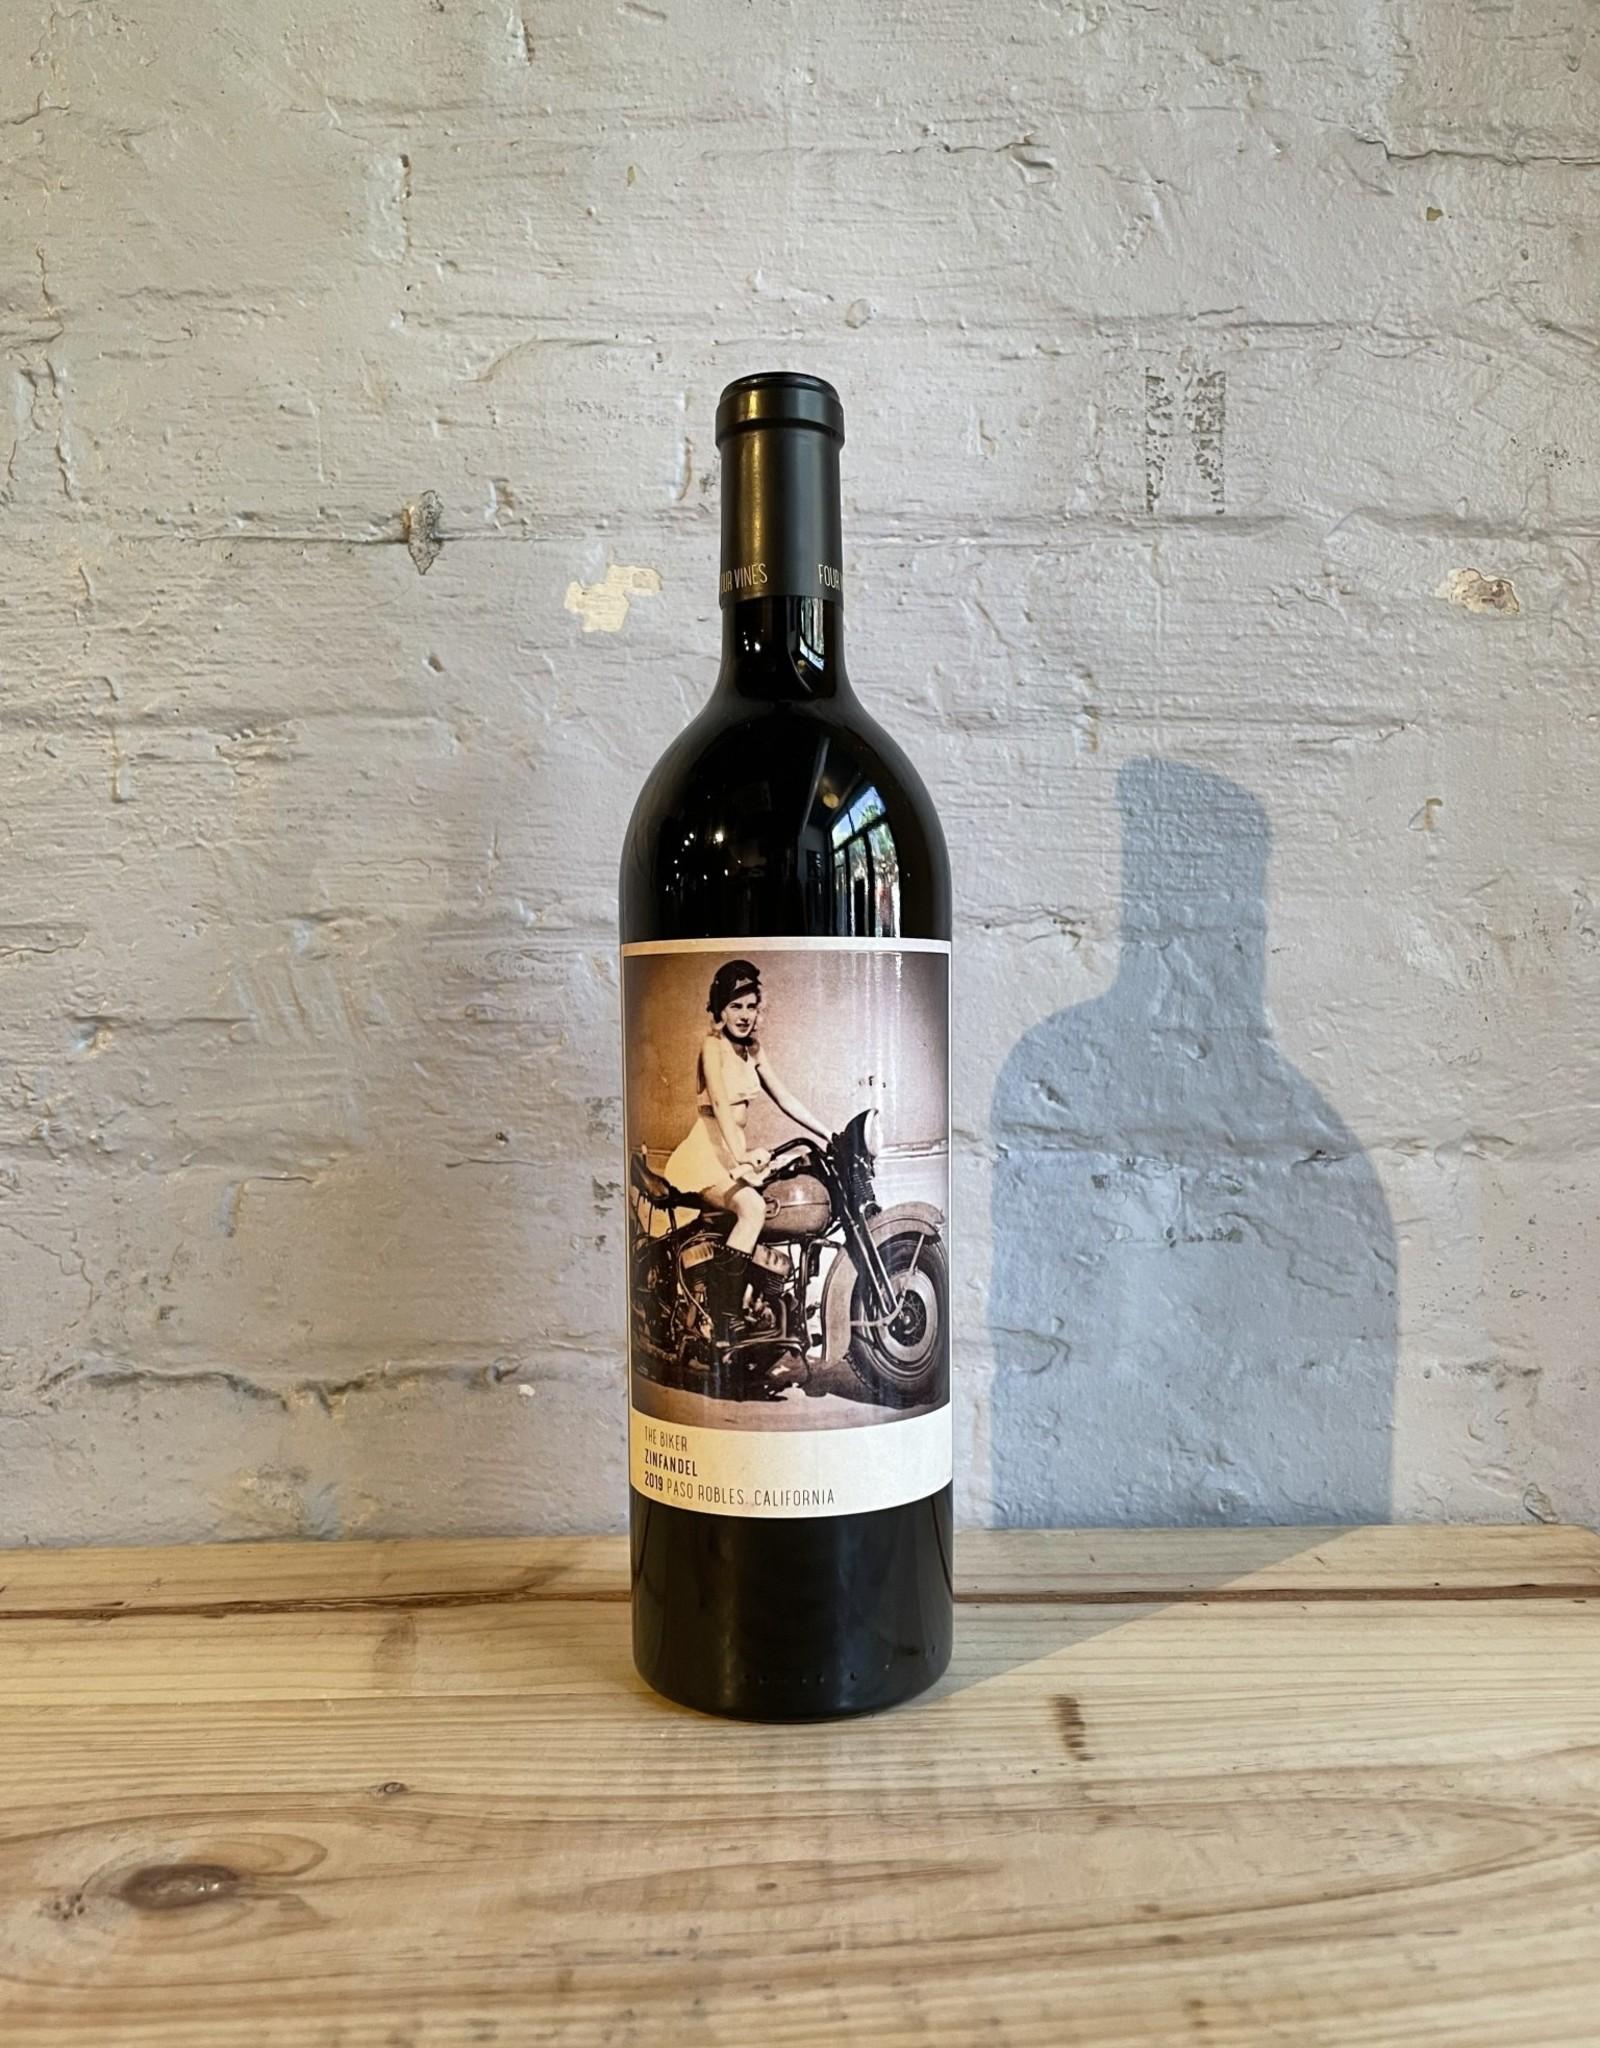 Wine 2019 Four Vines The Biker Zinfandel - Paso Robles, California (750ml)